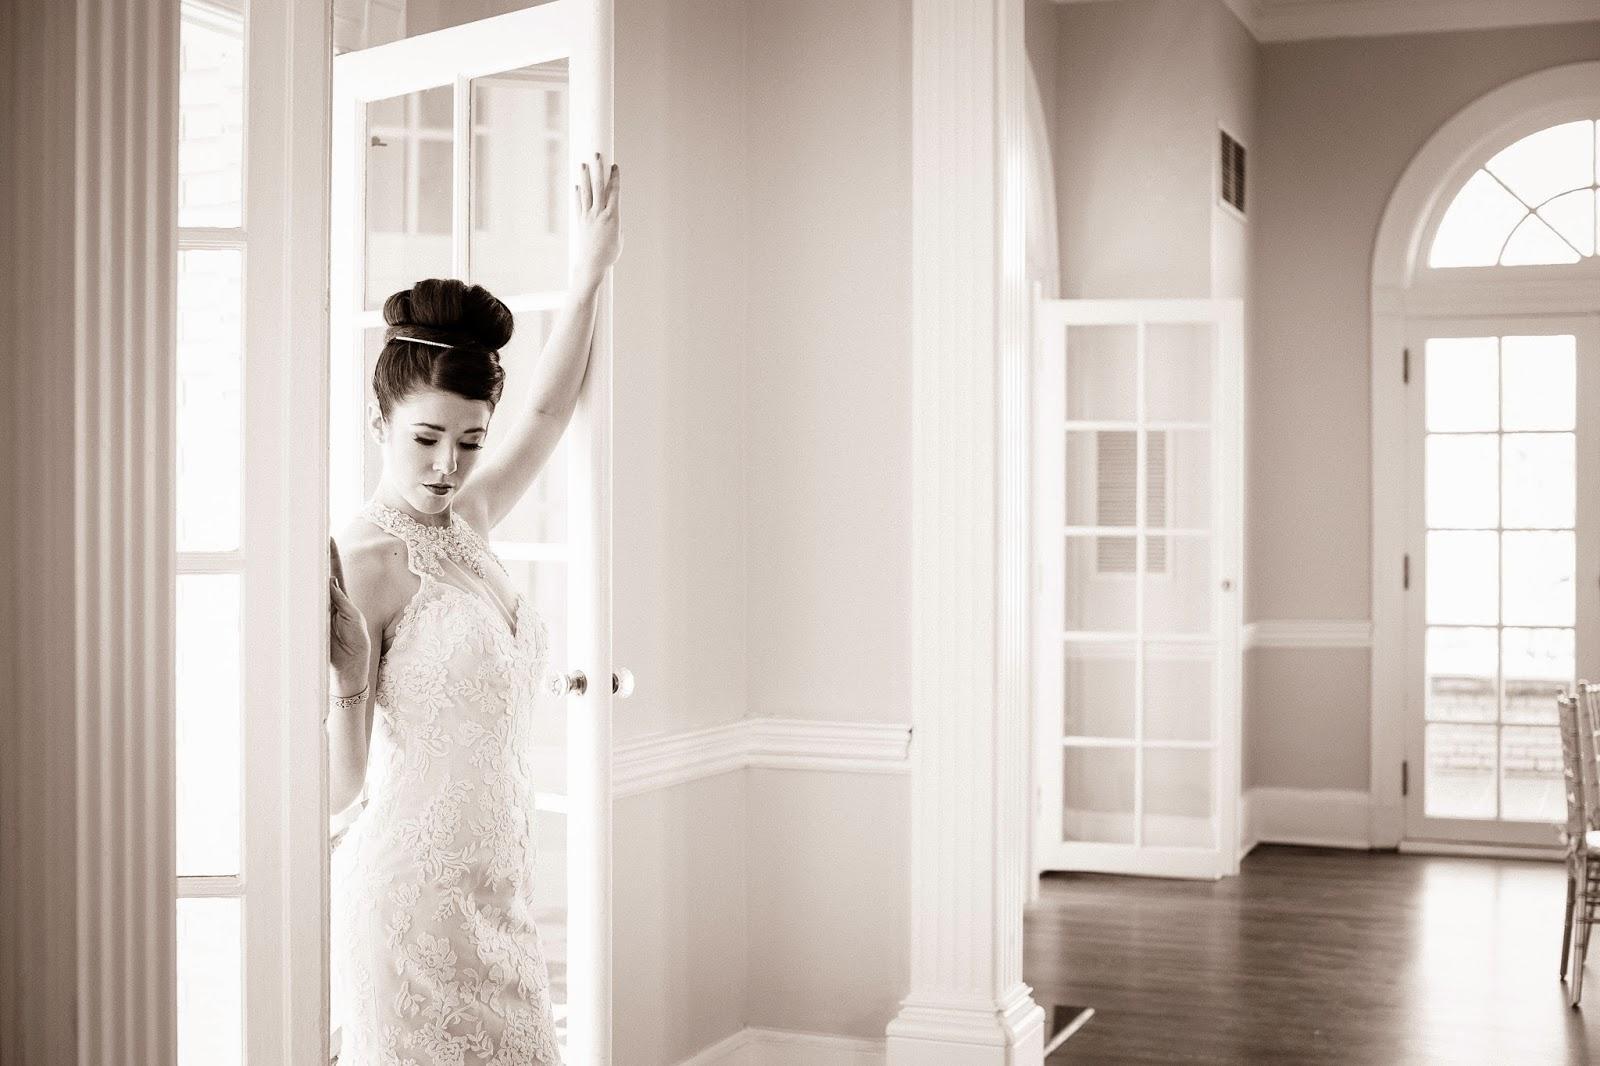 Bridal Portraits Inpiration